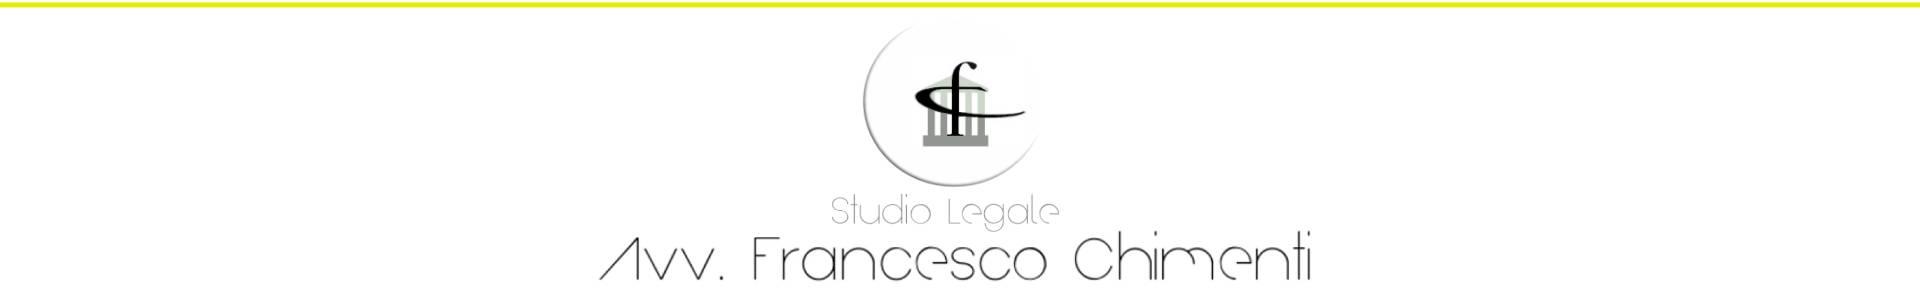 - Studio Legale Avv. Francesco Chimenti - P.I.: 02105910786